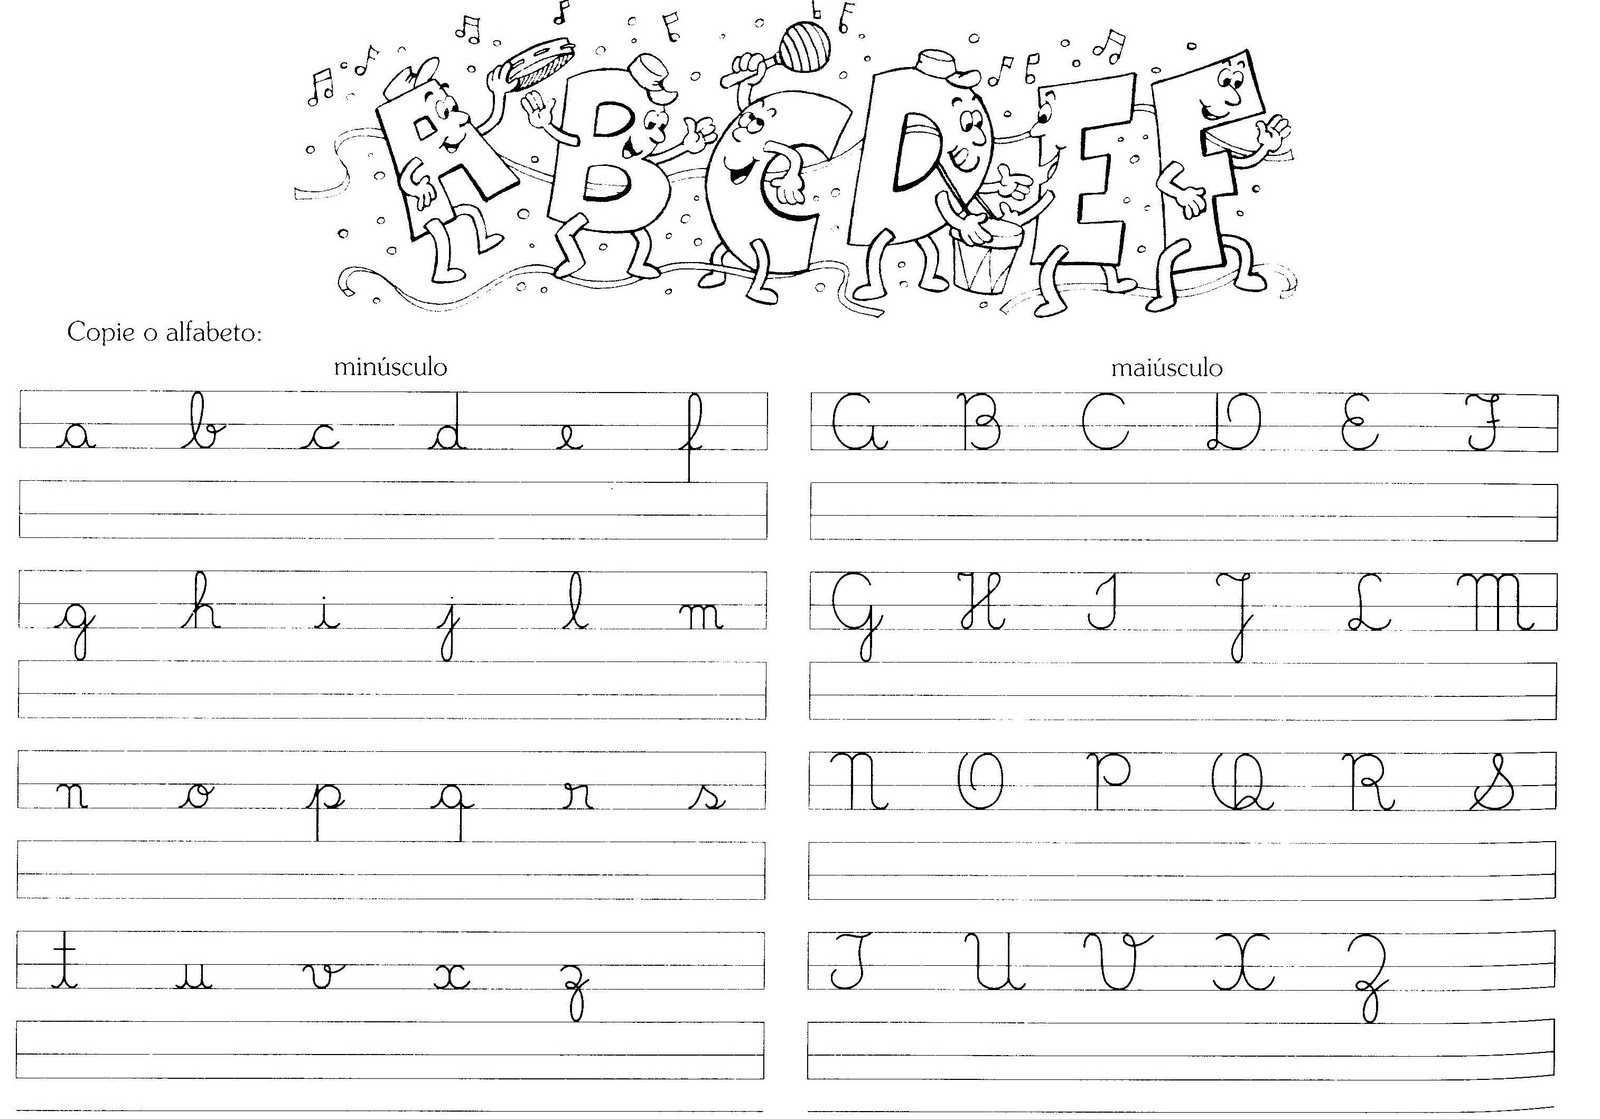 Aprendendo a ensinar caligrafia for L practicas